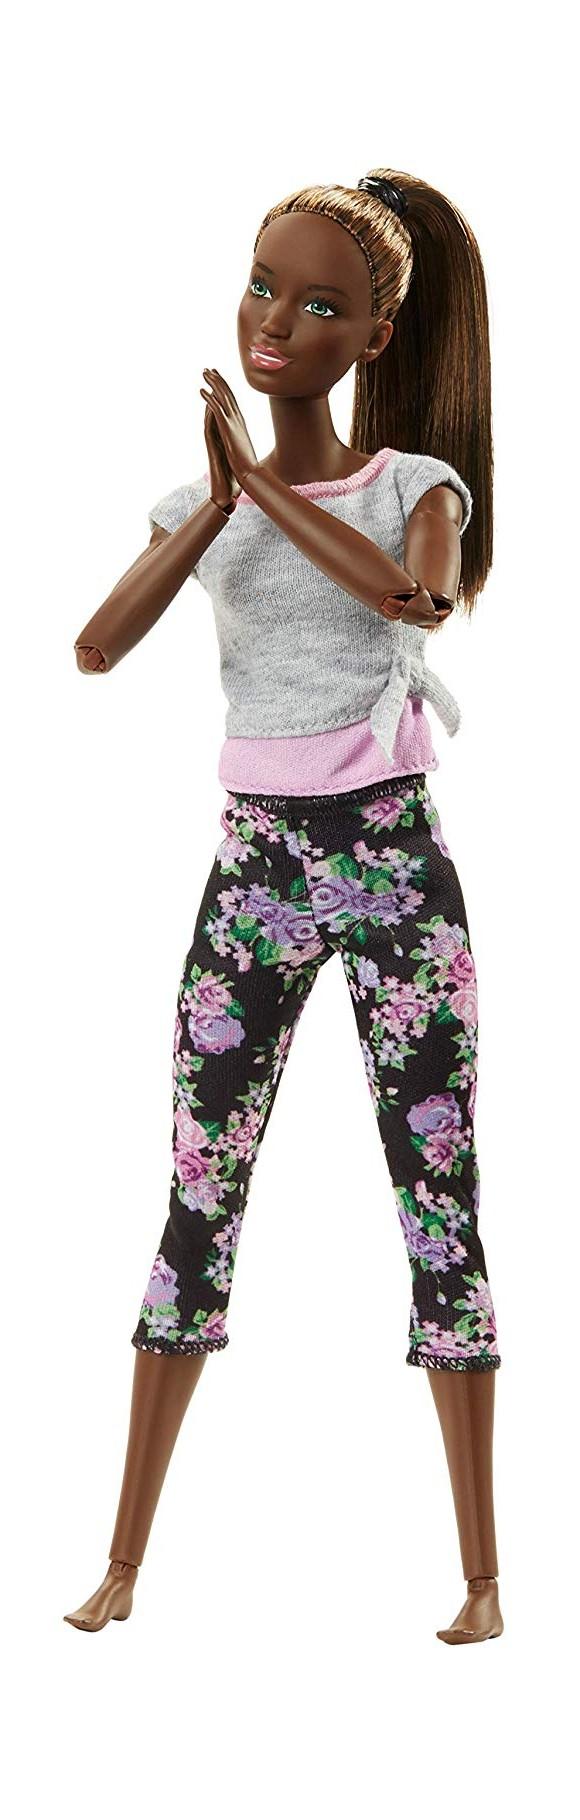 Barbie - Made to Move - Lilla Trøje (FTG83)